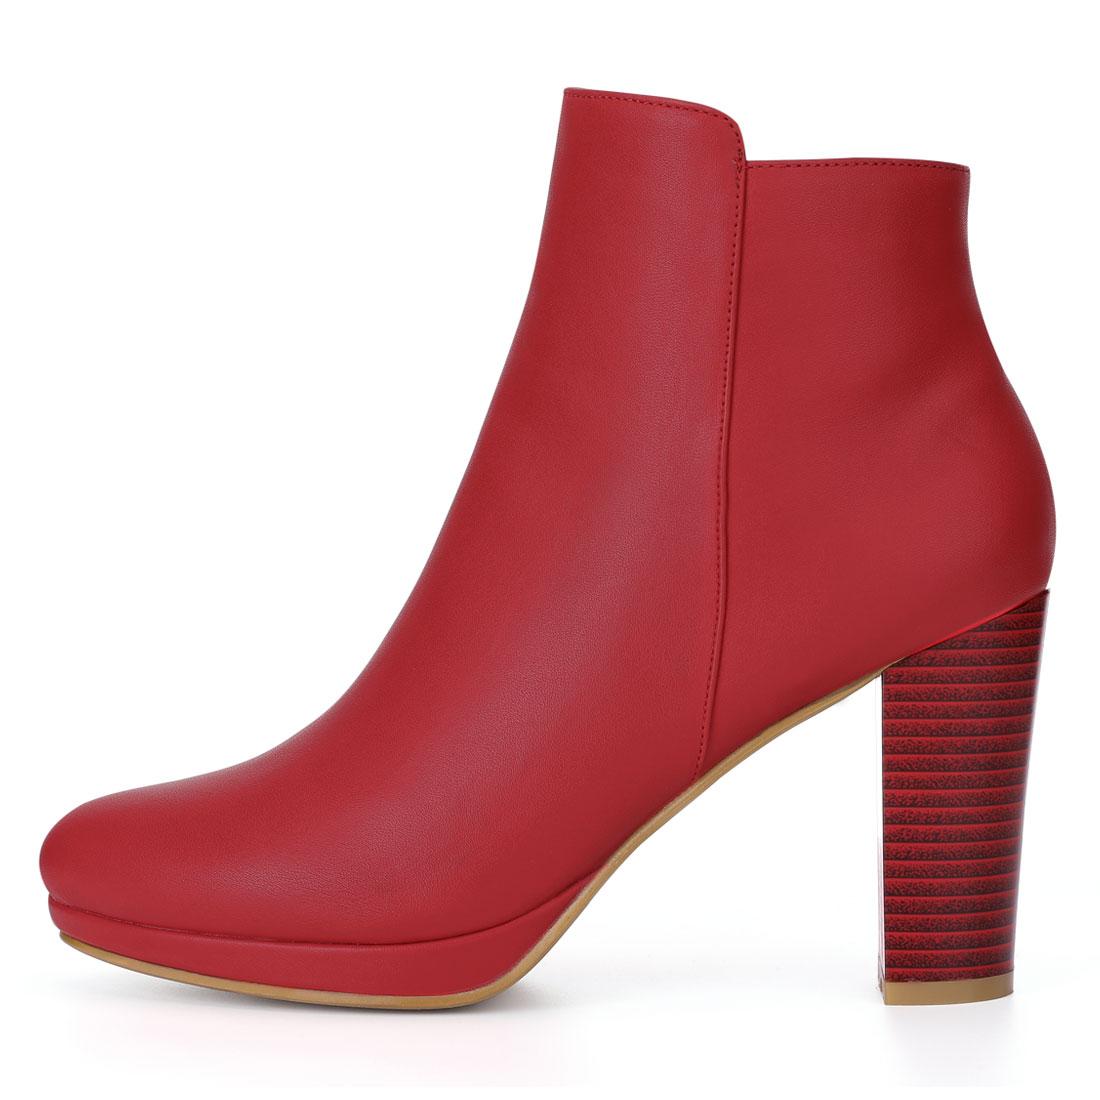 Allegra K Women Round Toe Chunky Heel Platform Ankle Boots Red US 9